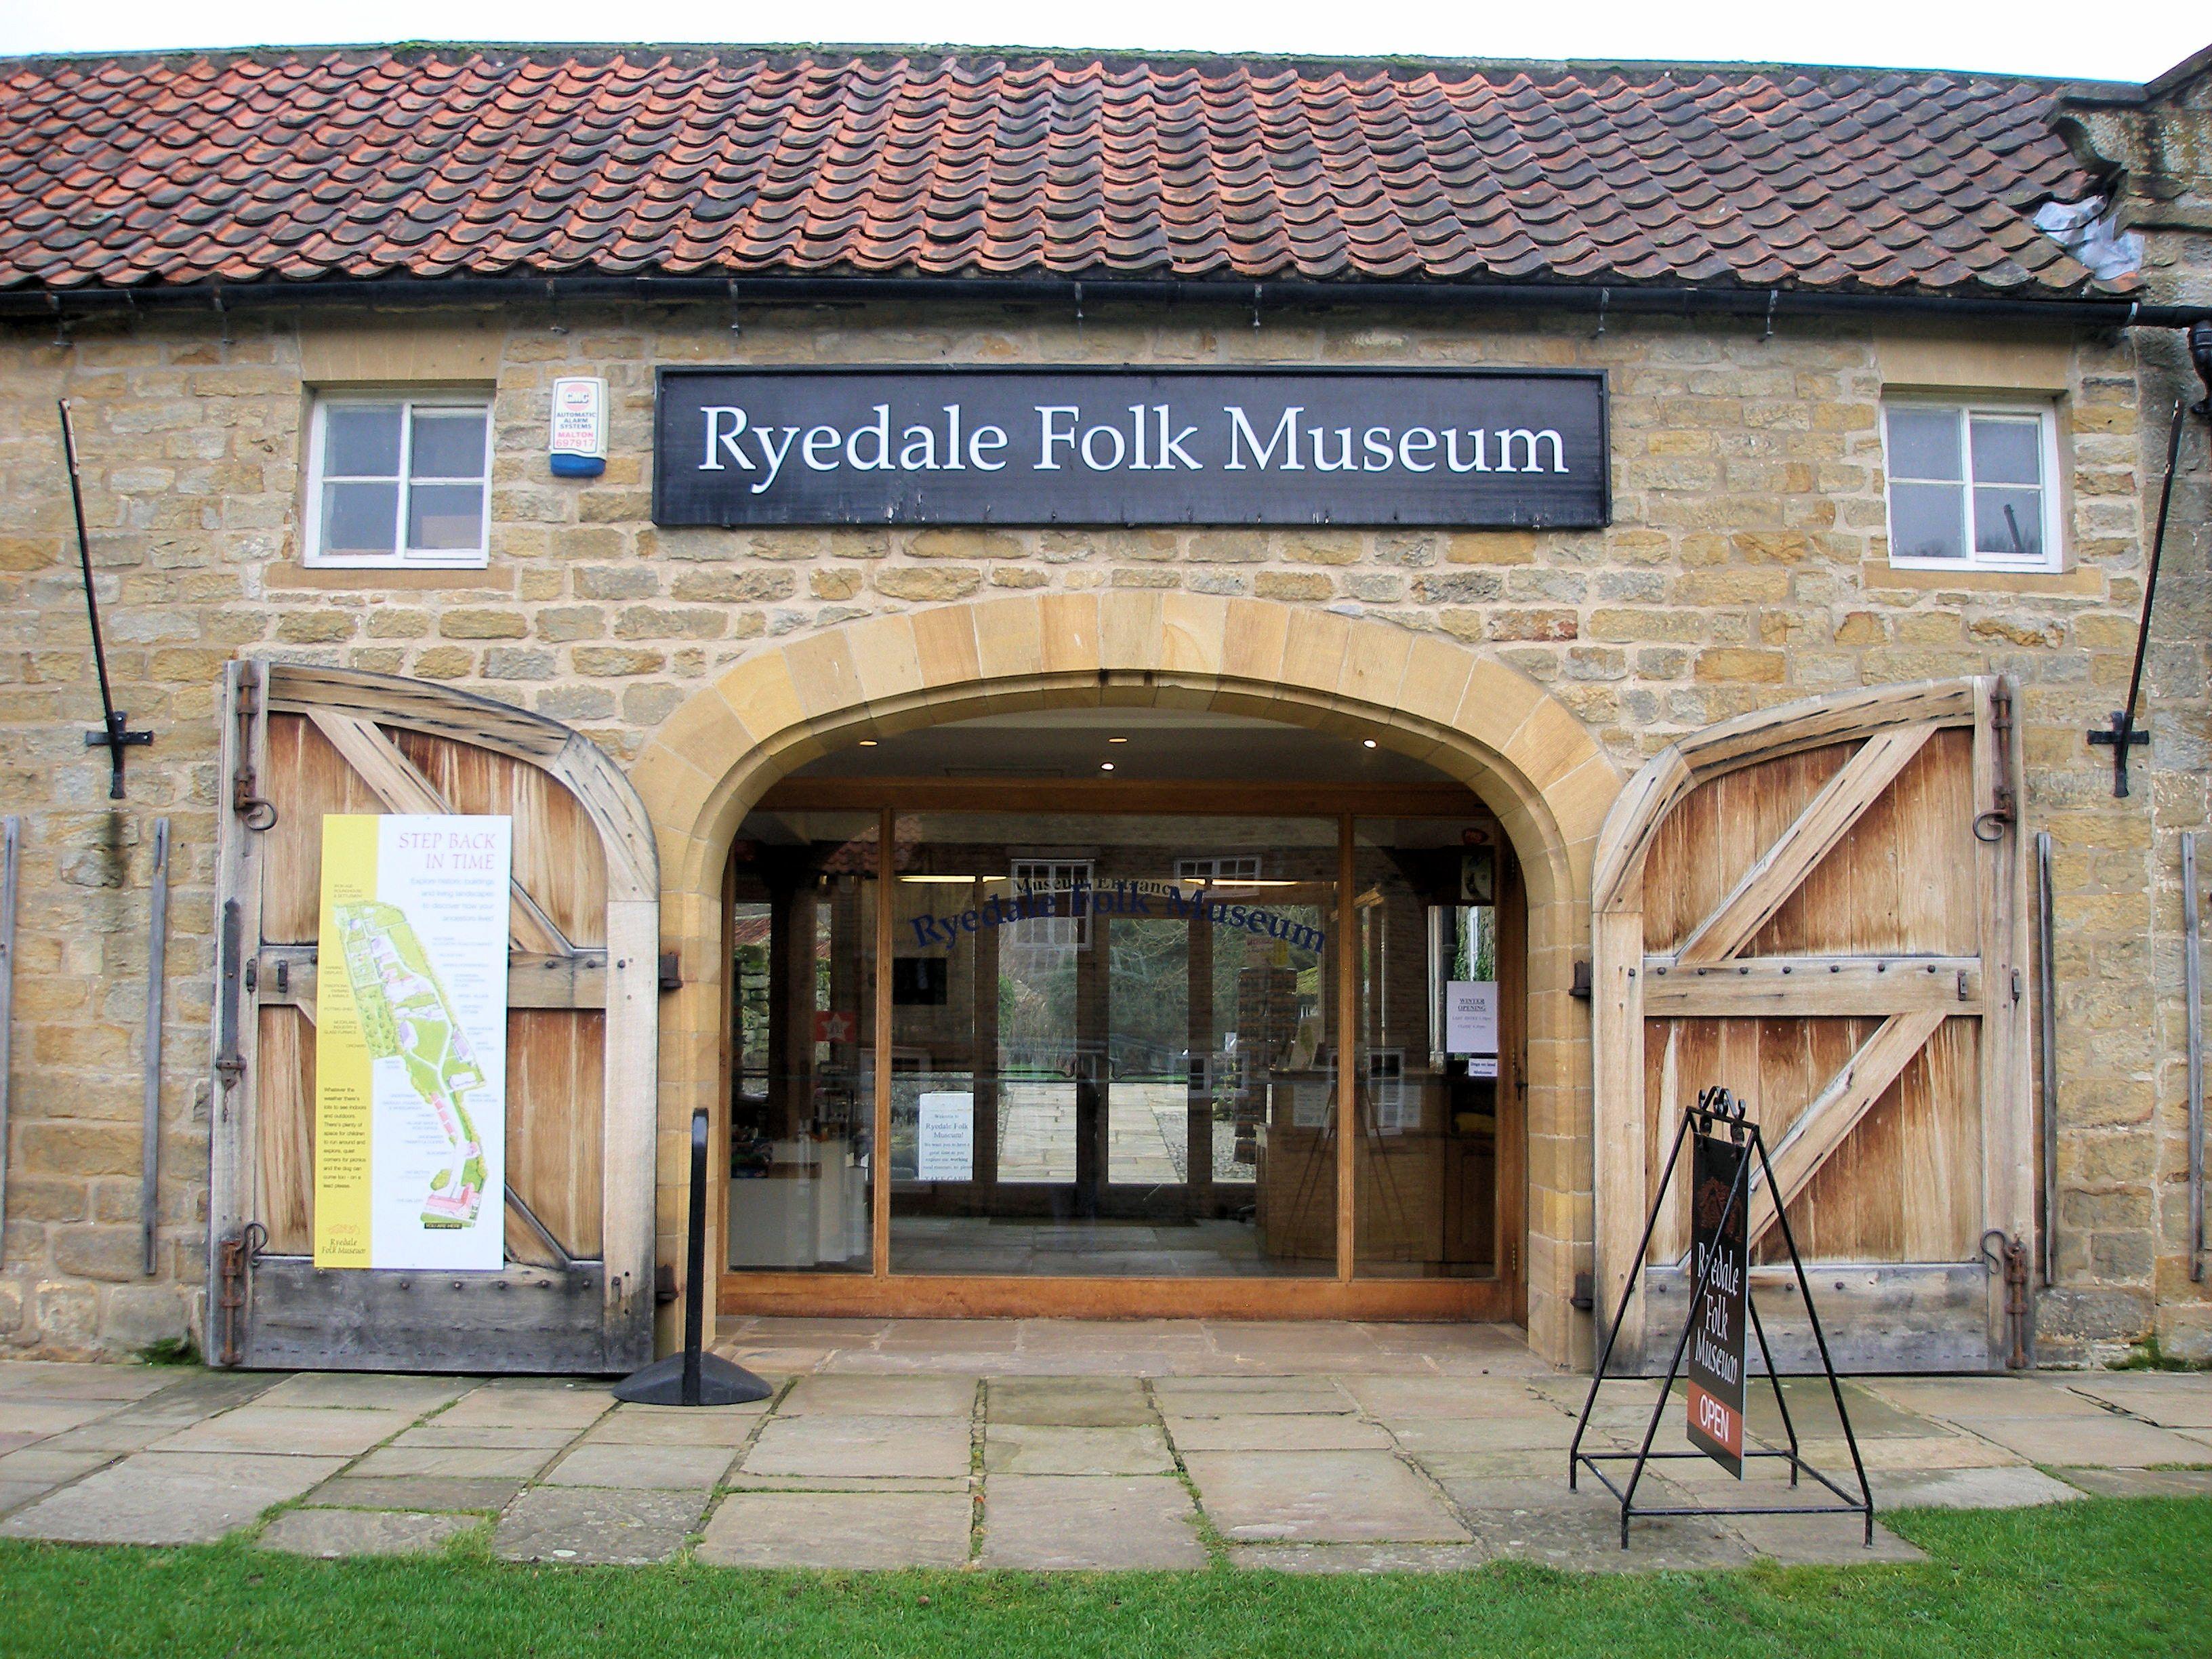 Ryedale Folk Museum - 10 minutes